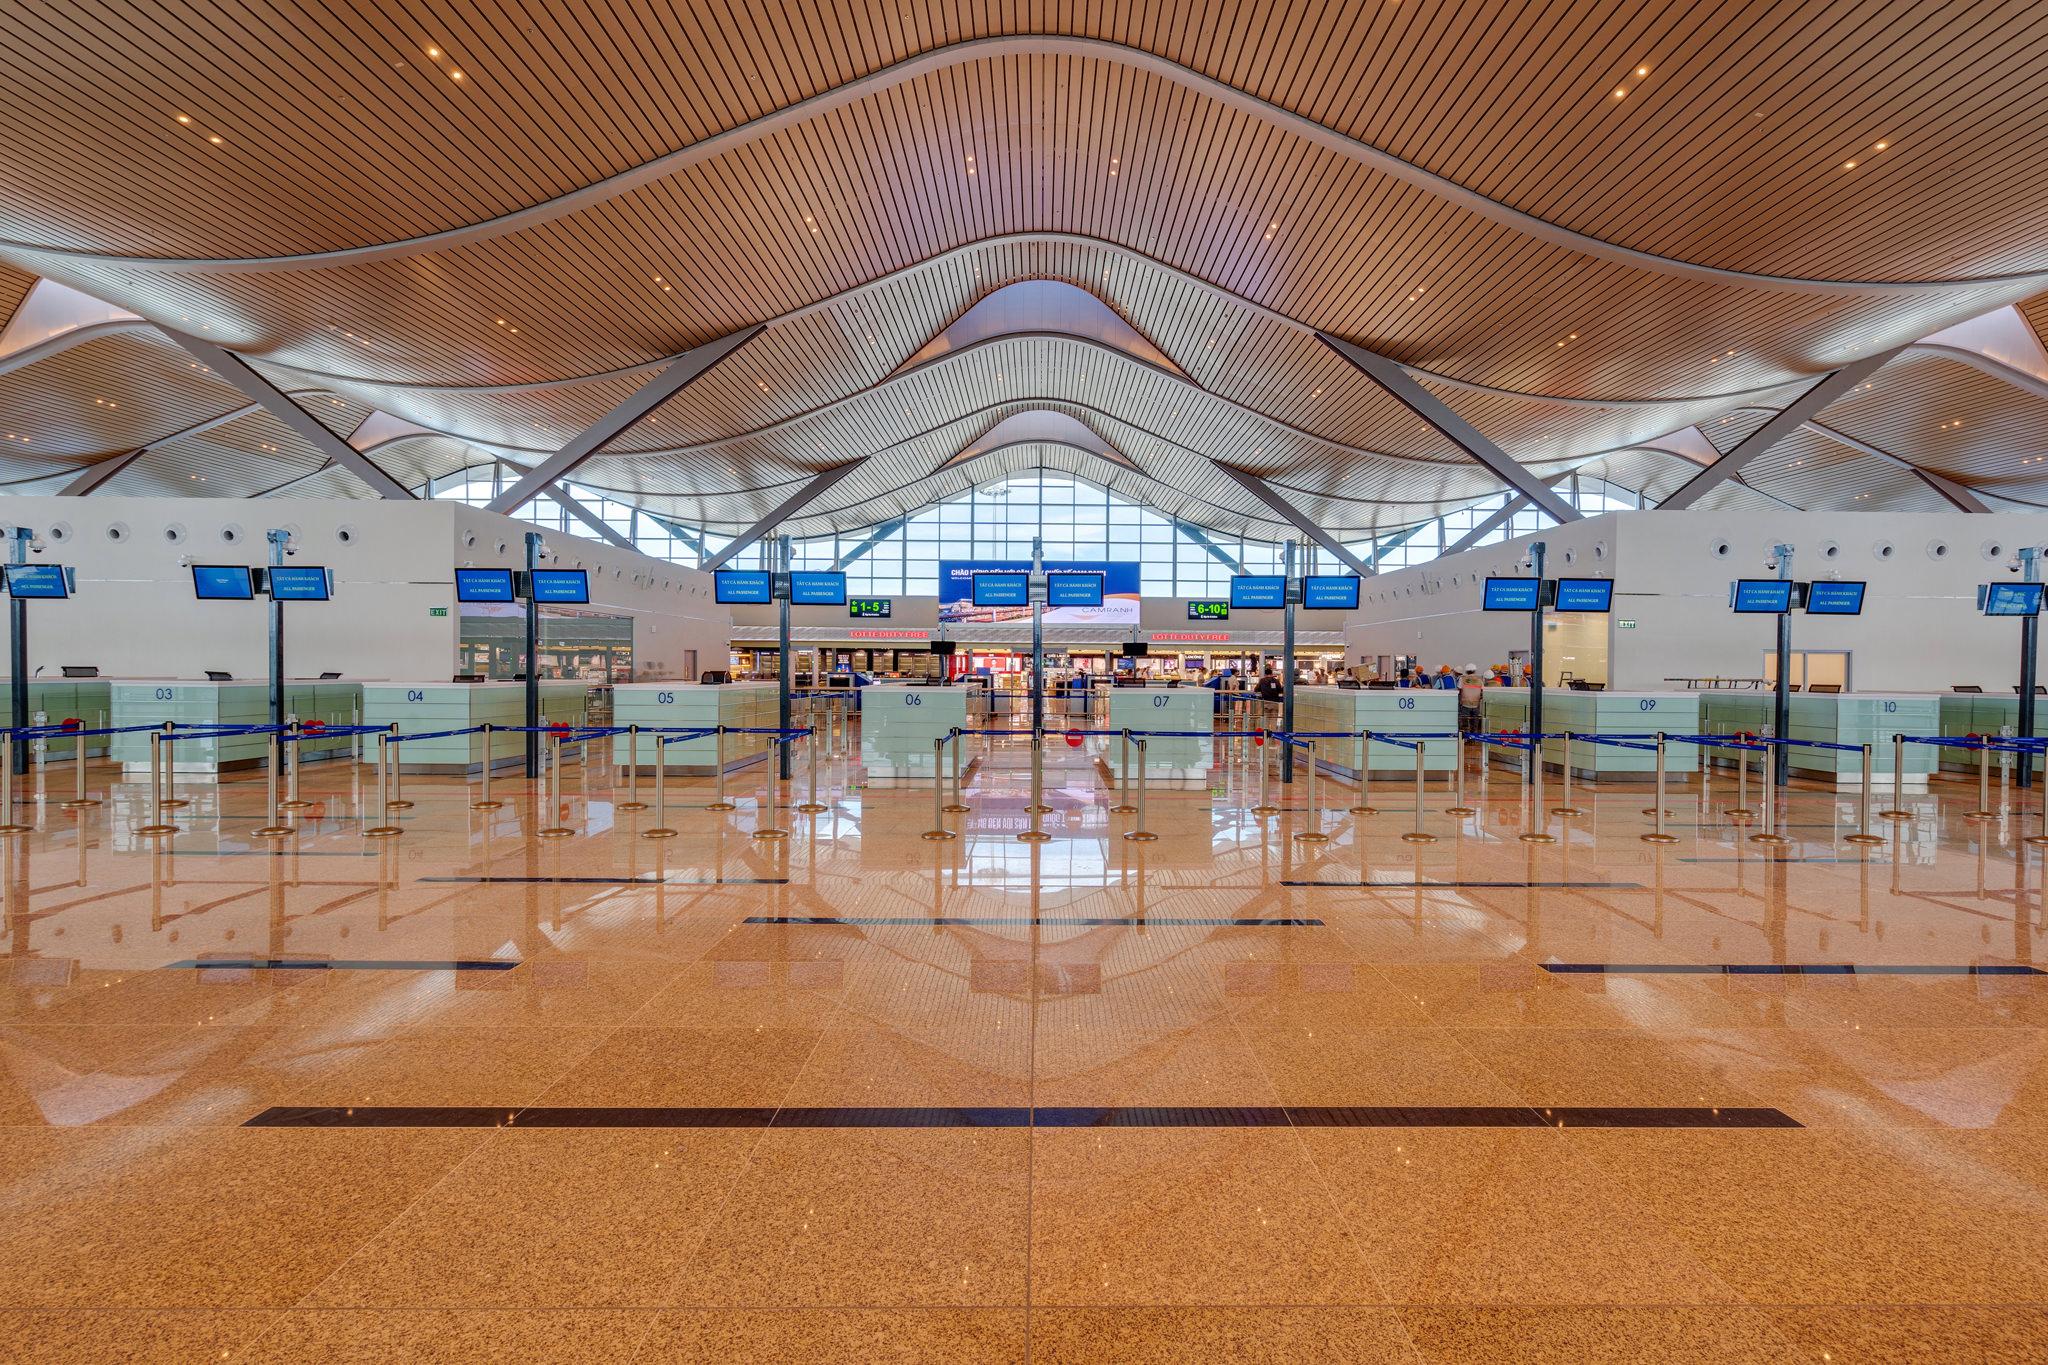 20180626 - Cam Ranh Airport - Architecture - 0333.jpg